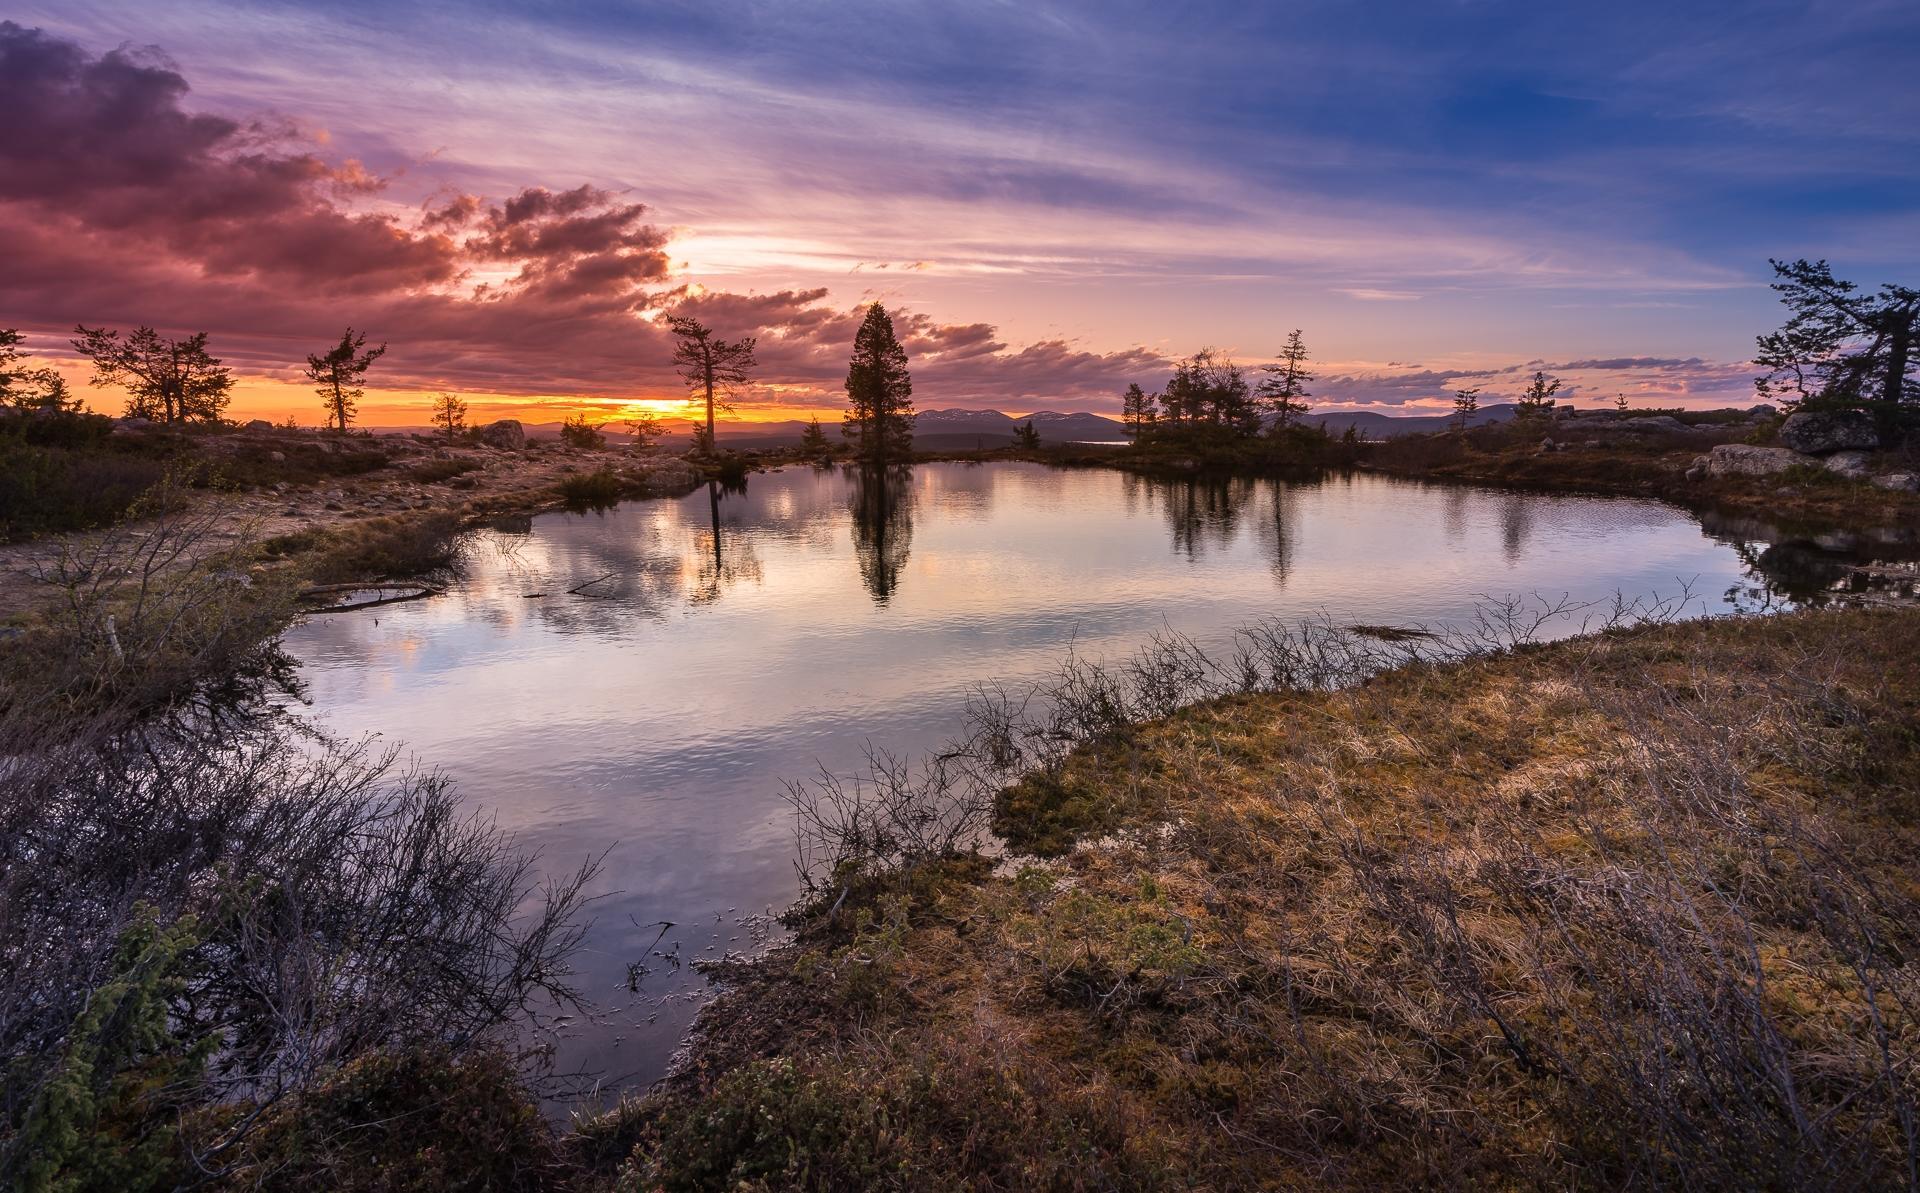 обои закат, озеро, деревья, пейзаж картинки фото